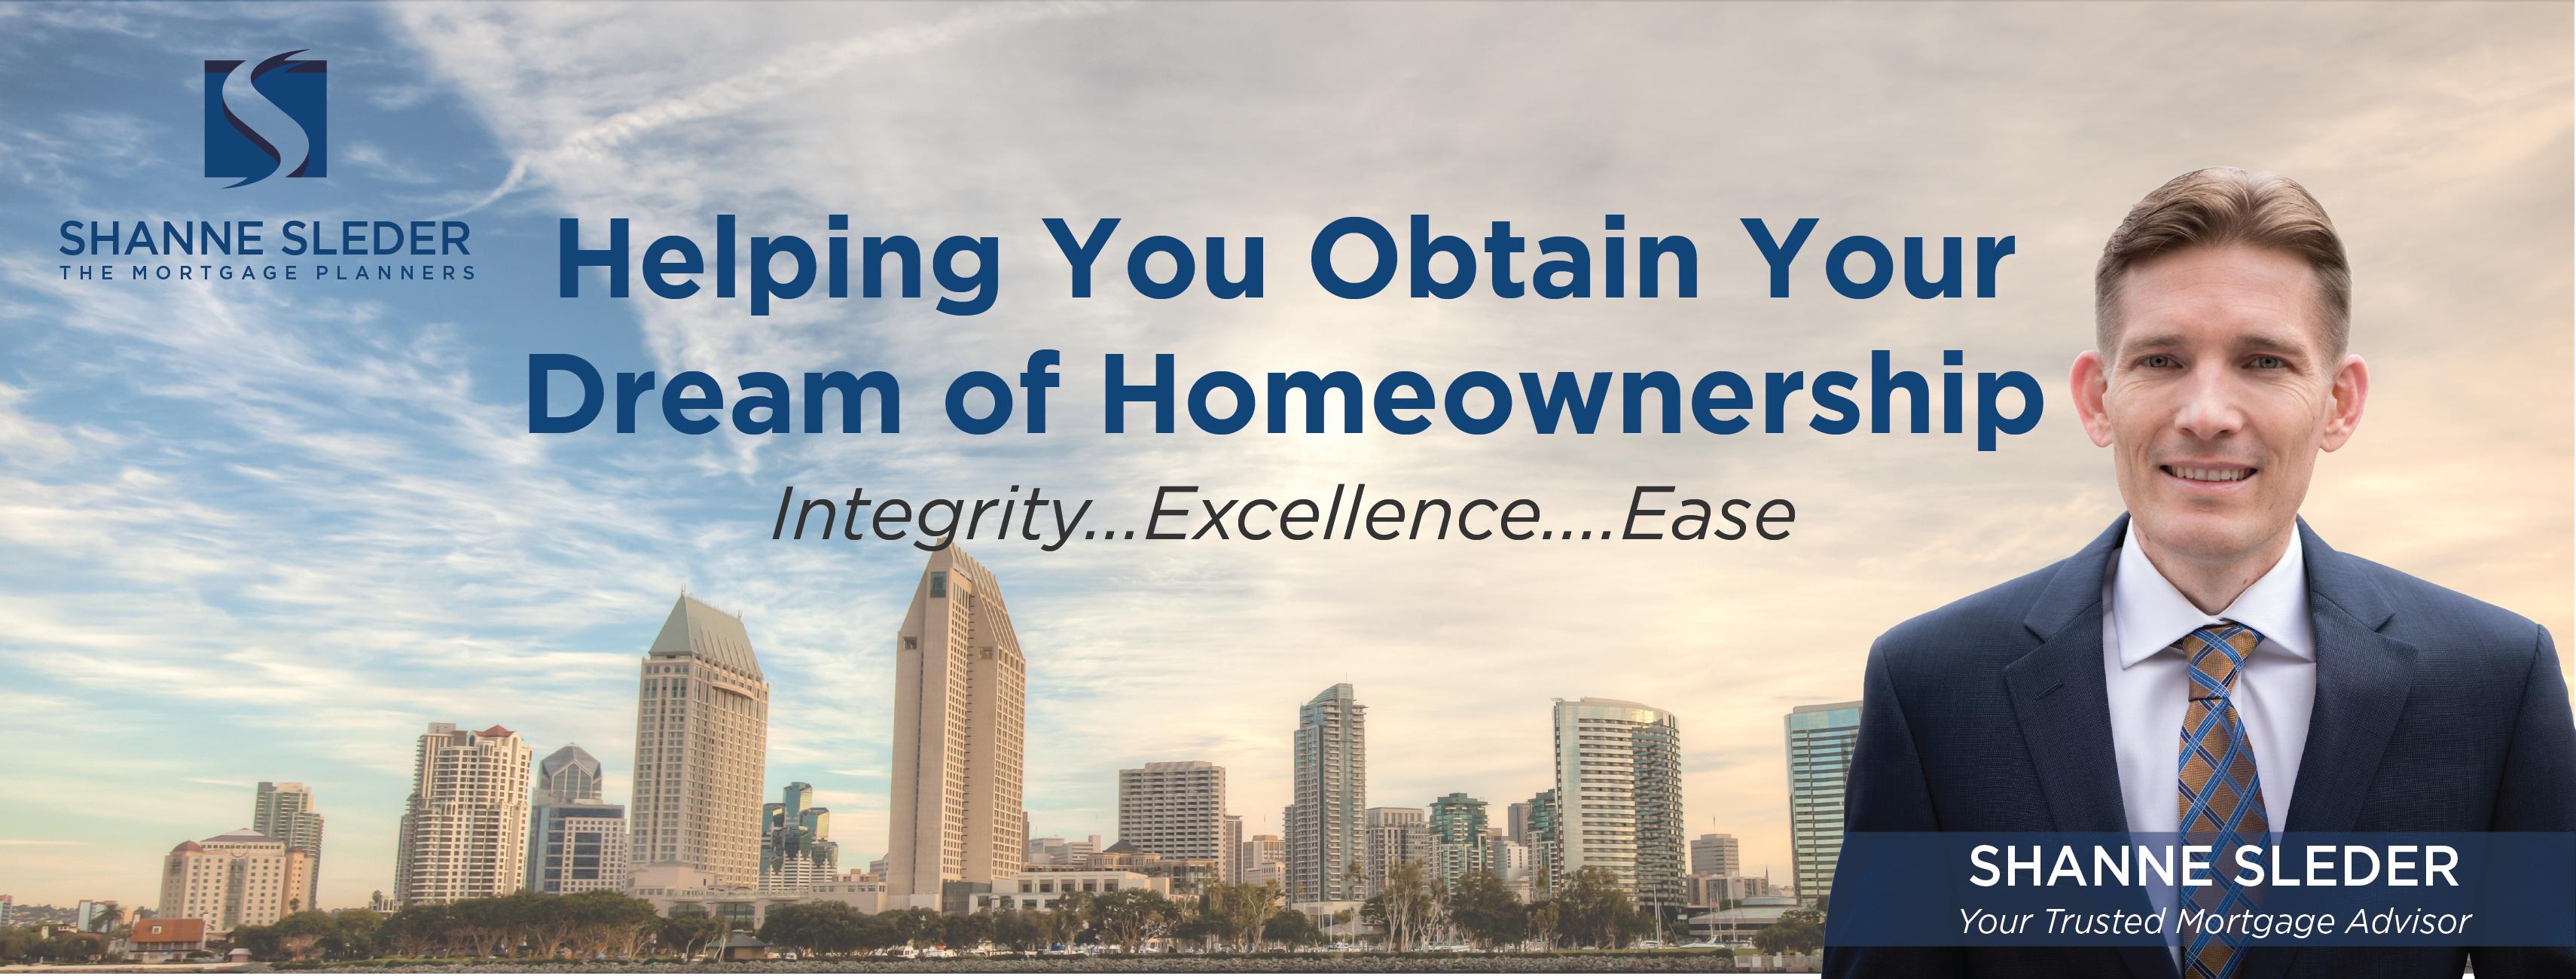 San Diego Mortgage Lender